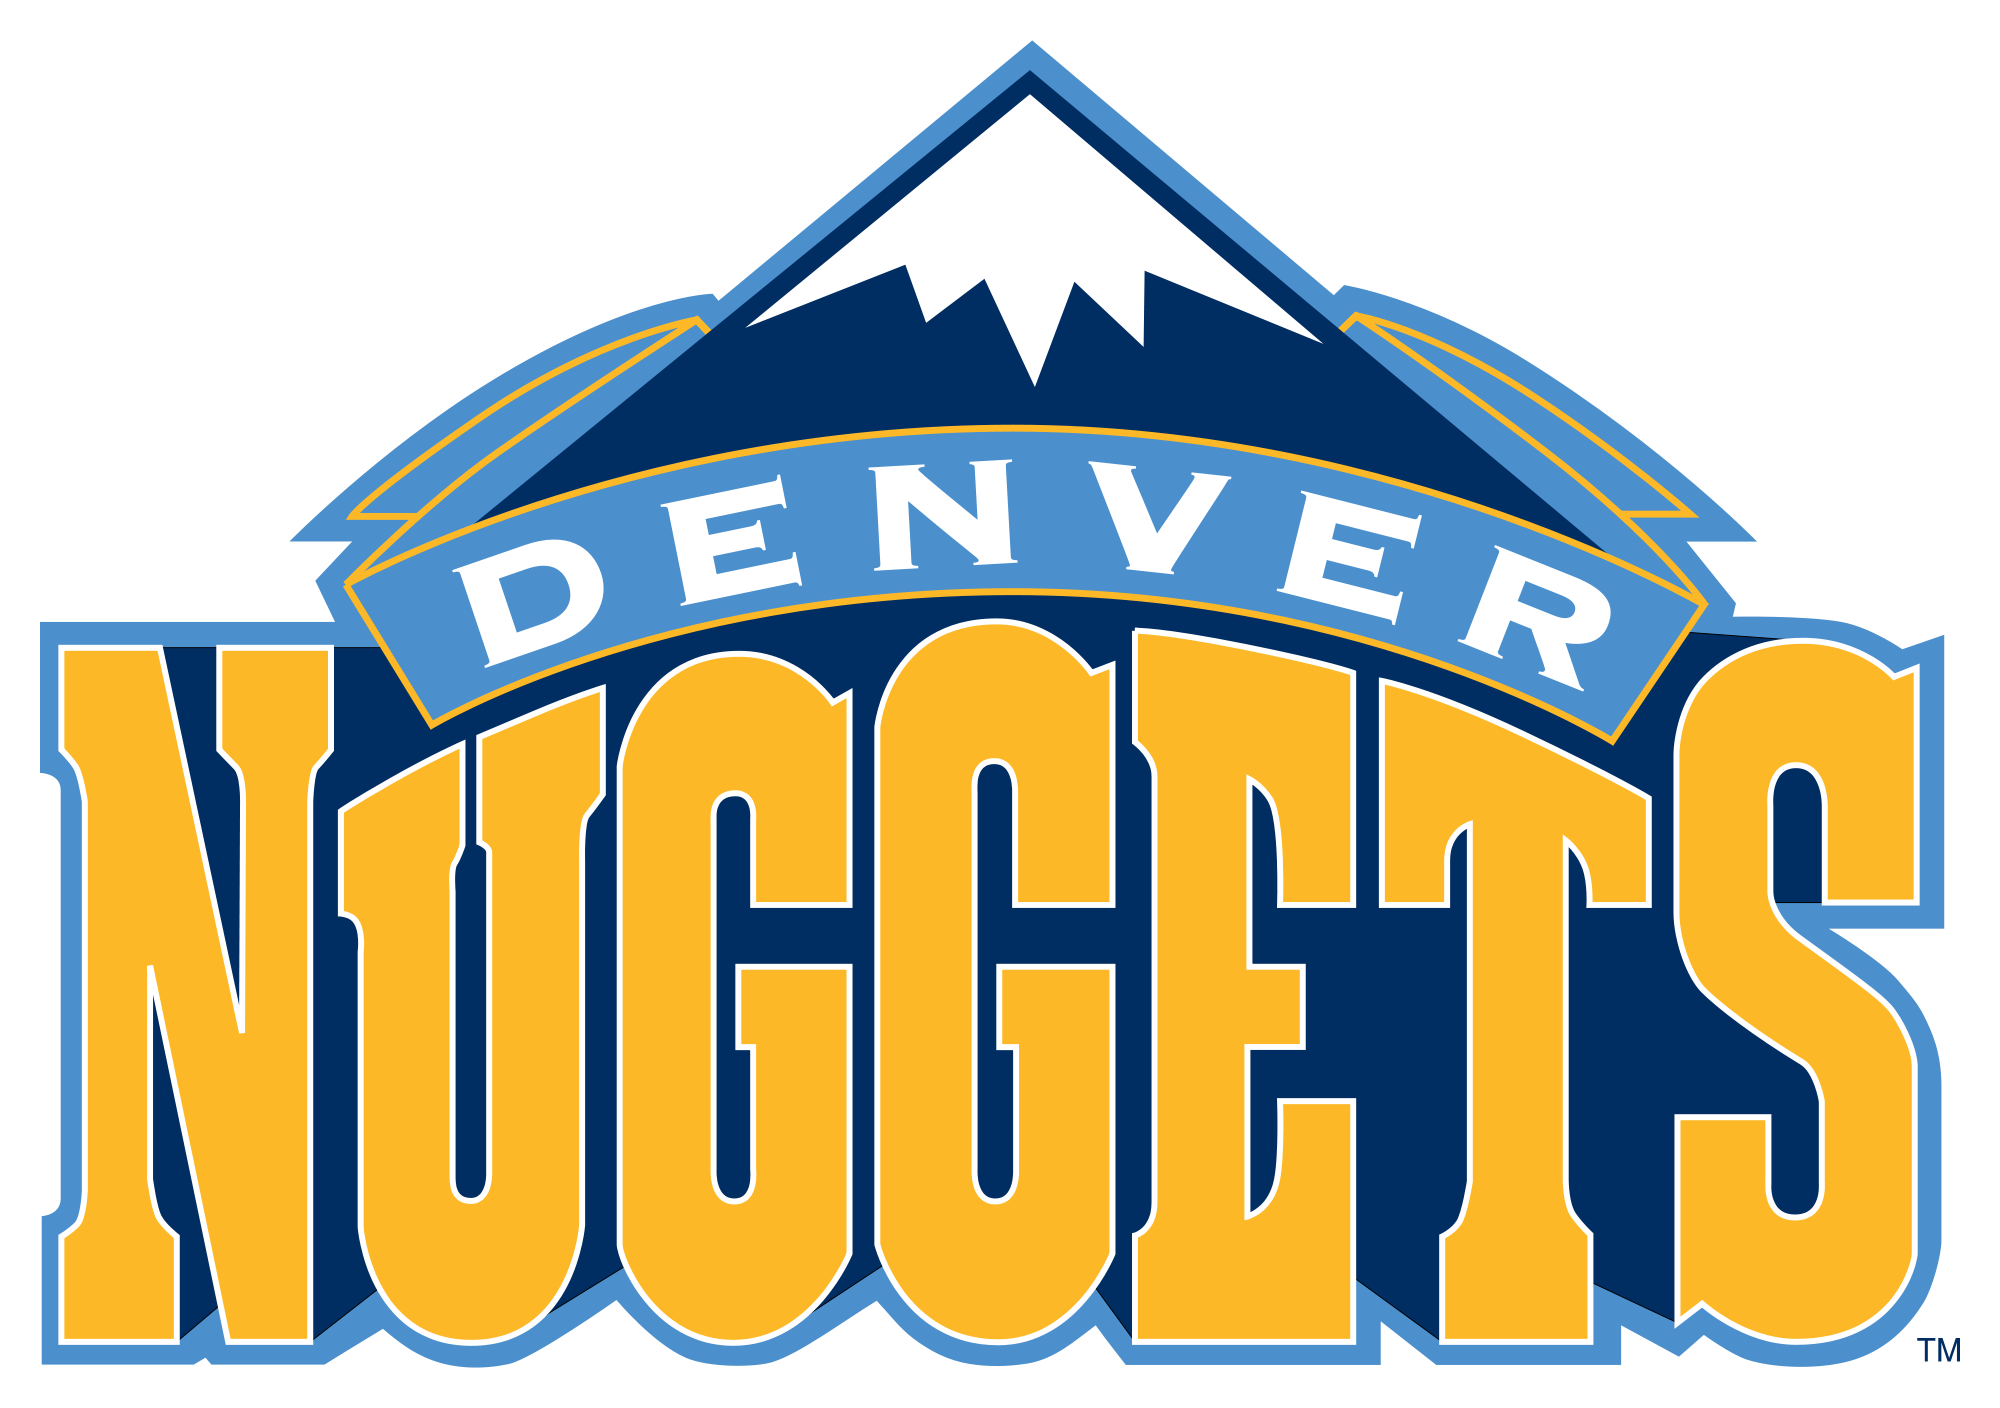 Denver Nuggets Logo Wallpaper - NBA Wallpaper Lovers | NBA Wallpaper ...